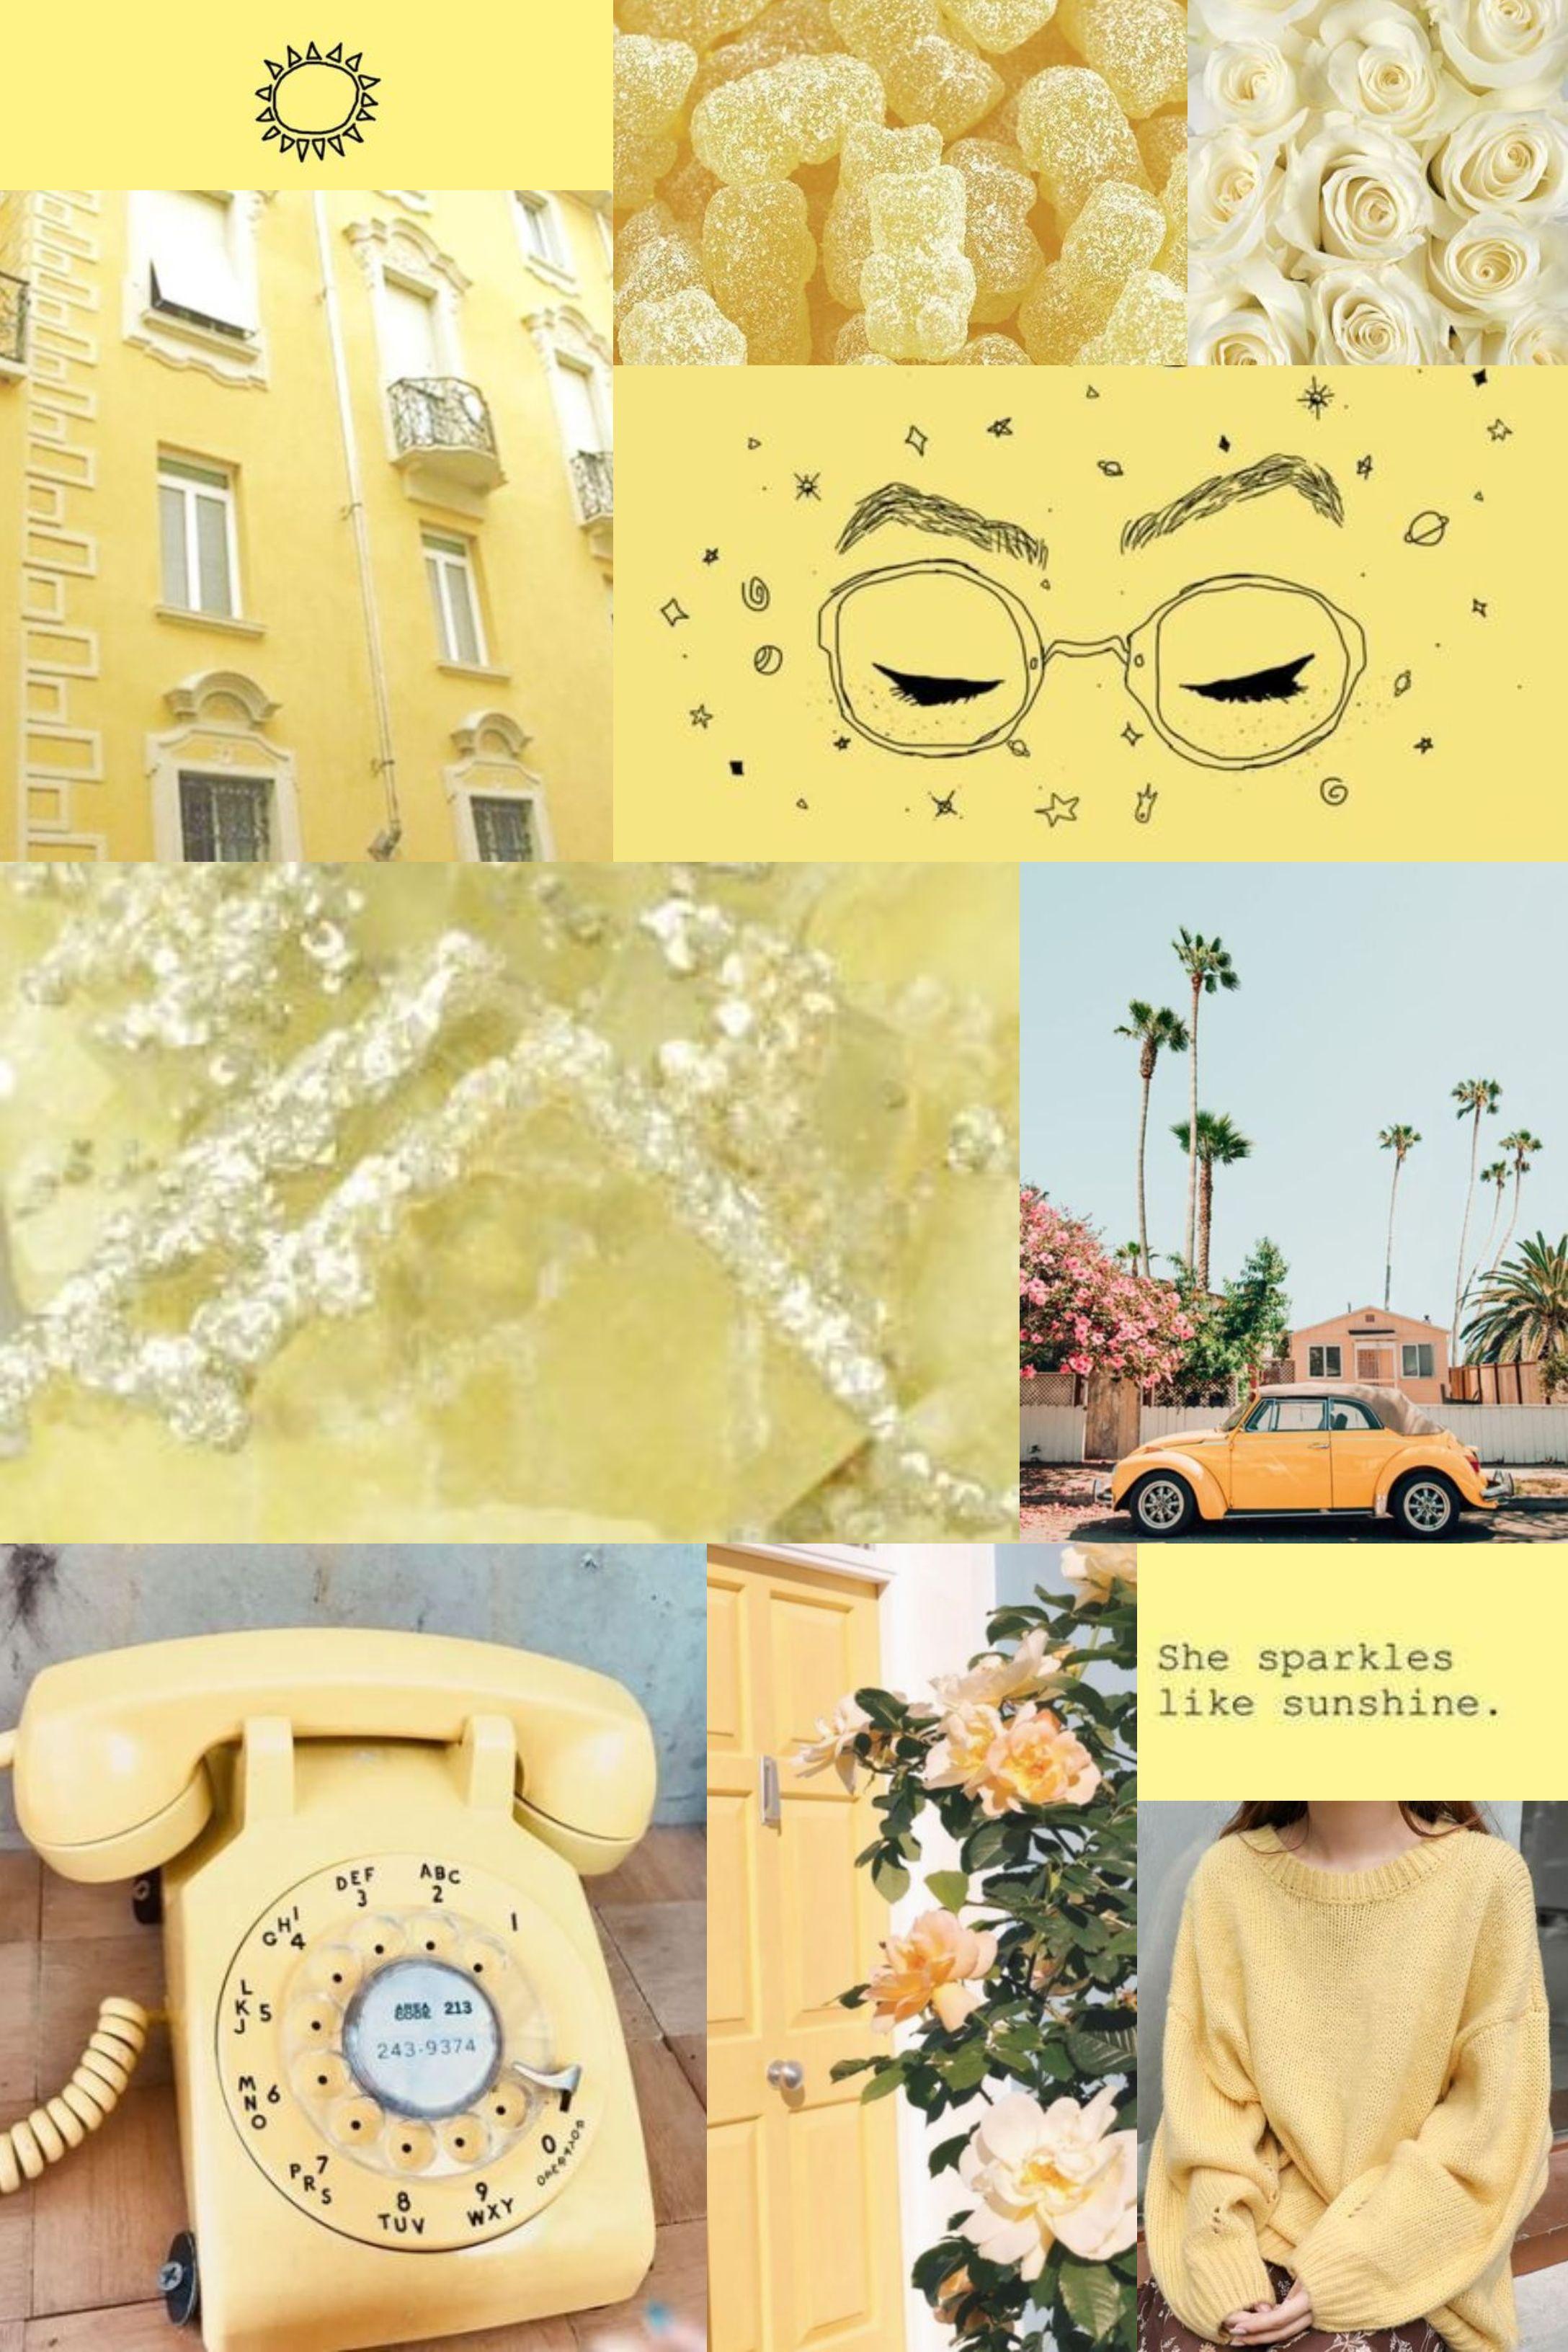 Light Yellow Mood Board Aesthetic Collage Wallpaper Yellow Aesthetic Pastel Yellow Aesthetic Aesthetic Collage Aesthetic wallpaper collage yellow